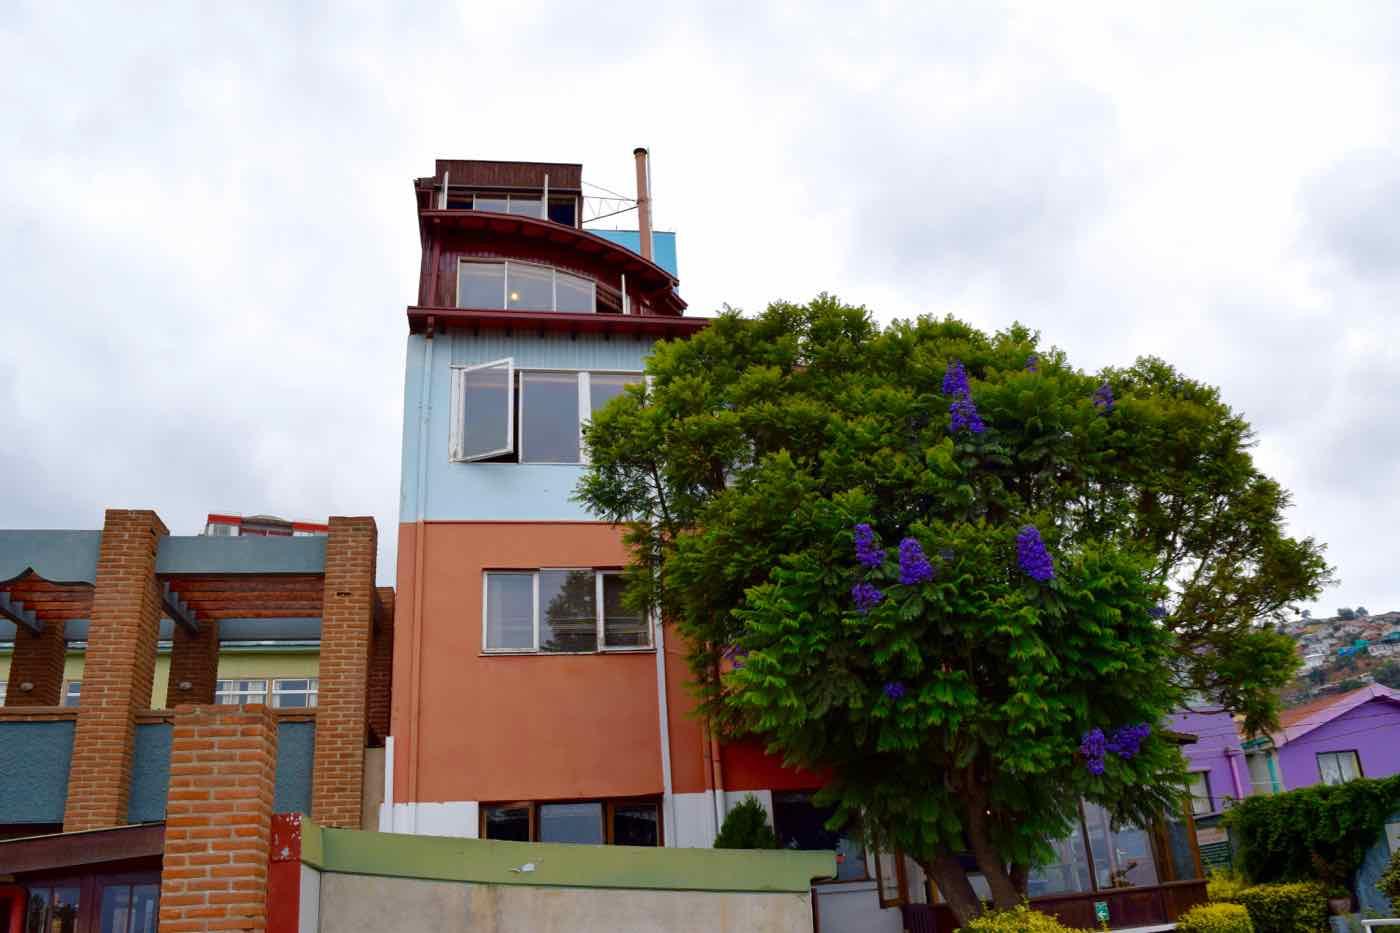 La Sebastiana - Pablo Neruda's House